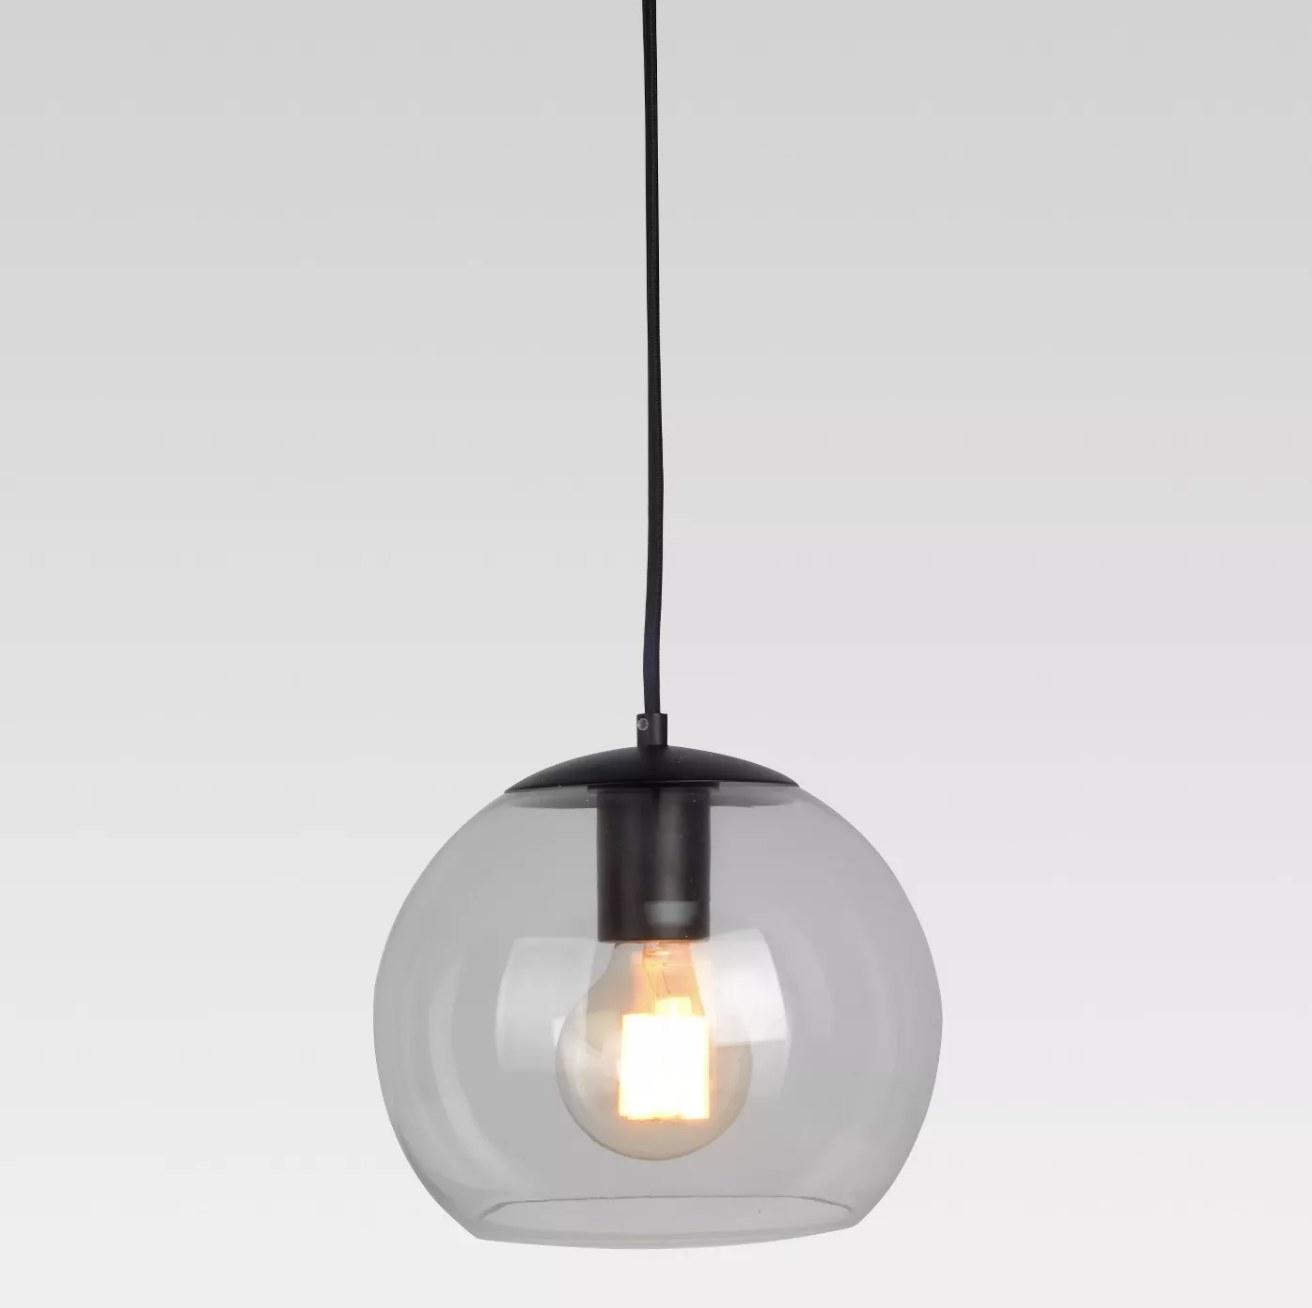 The glass globe light